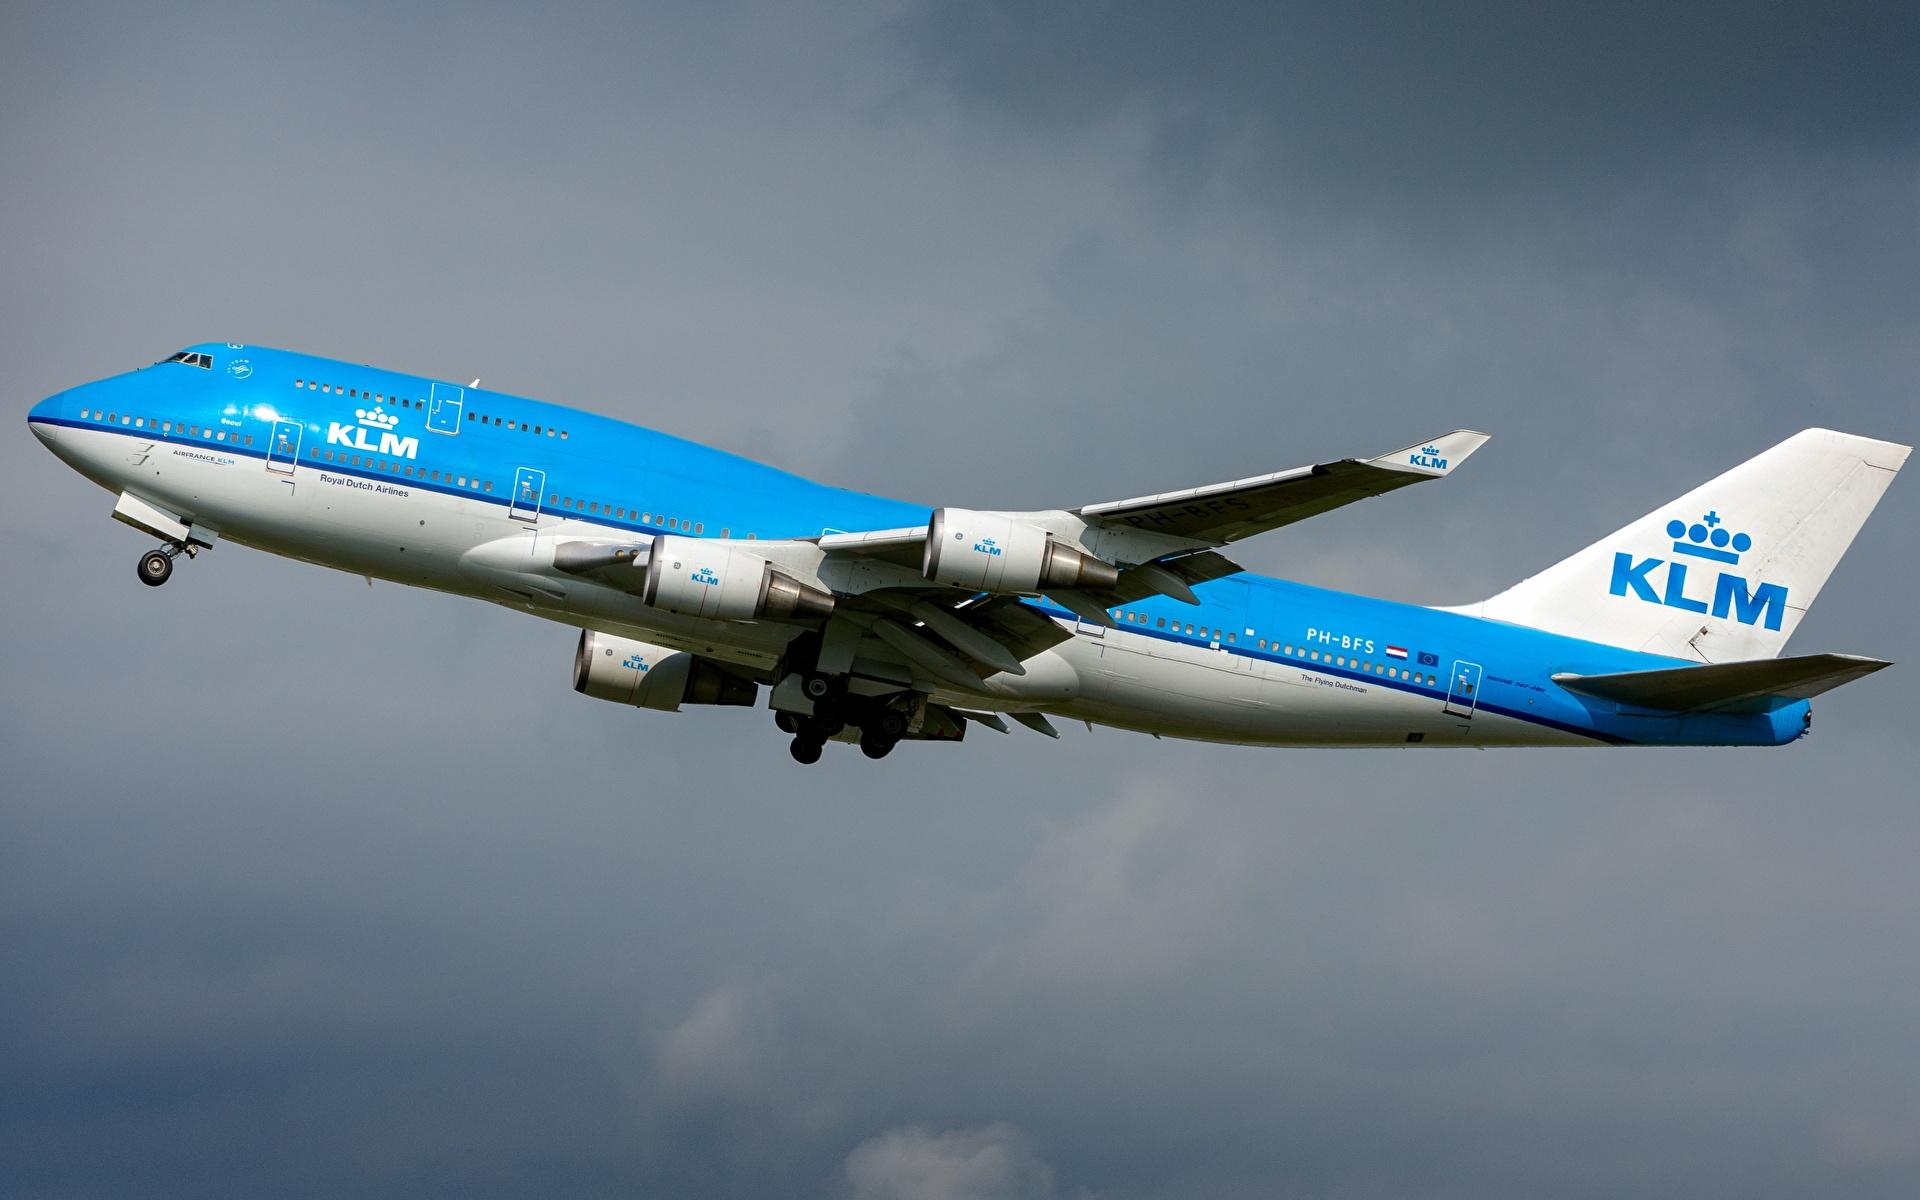 zdjęcia Boeing Samoloty Samolot pasażerski KLM 747-400M Lotnictwo 1920x1200 samolot